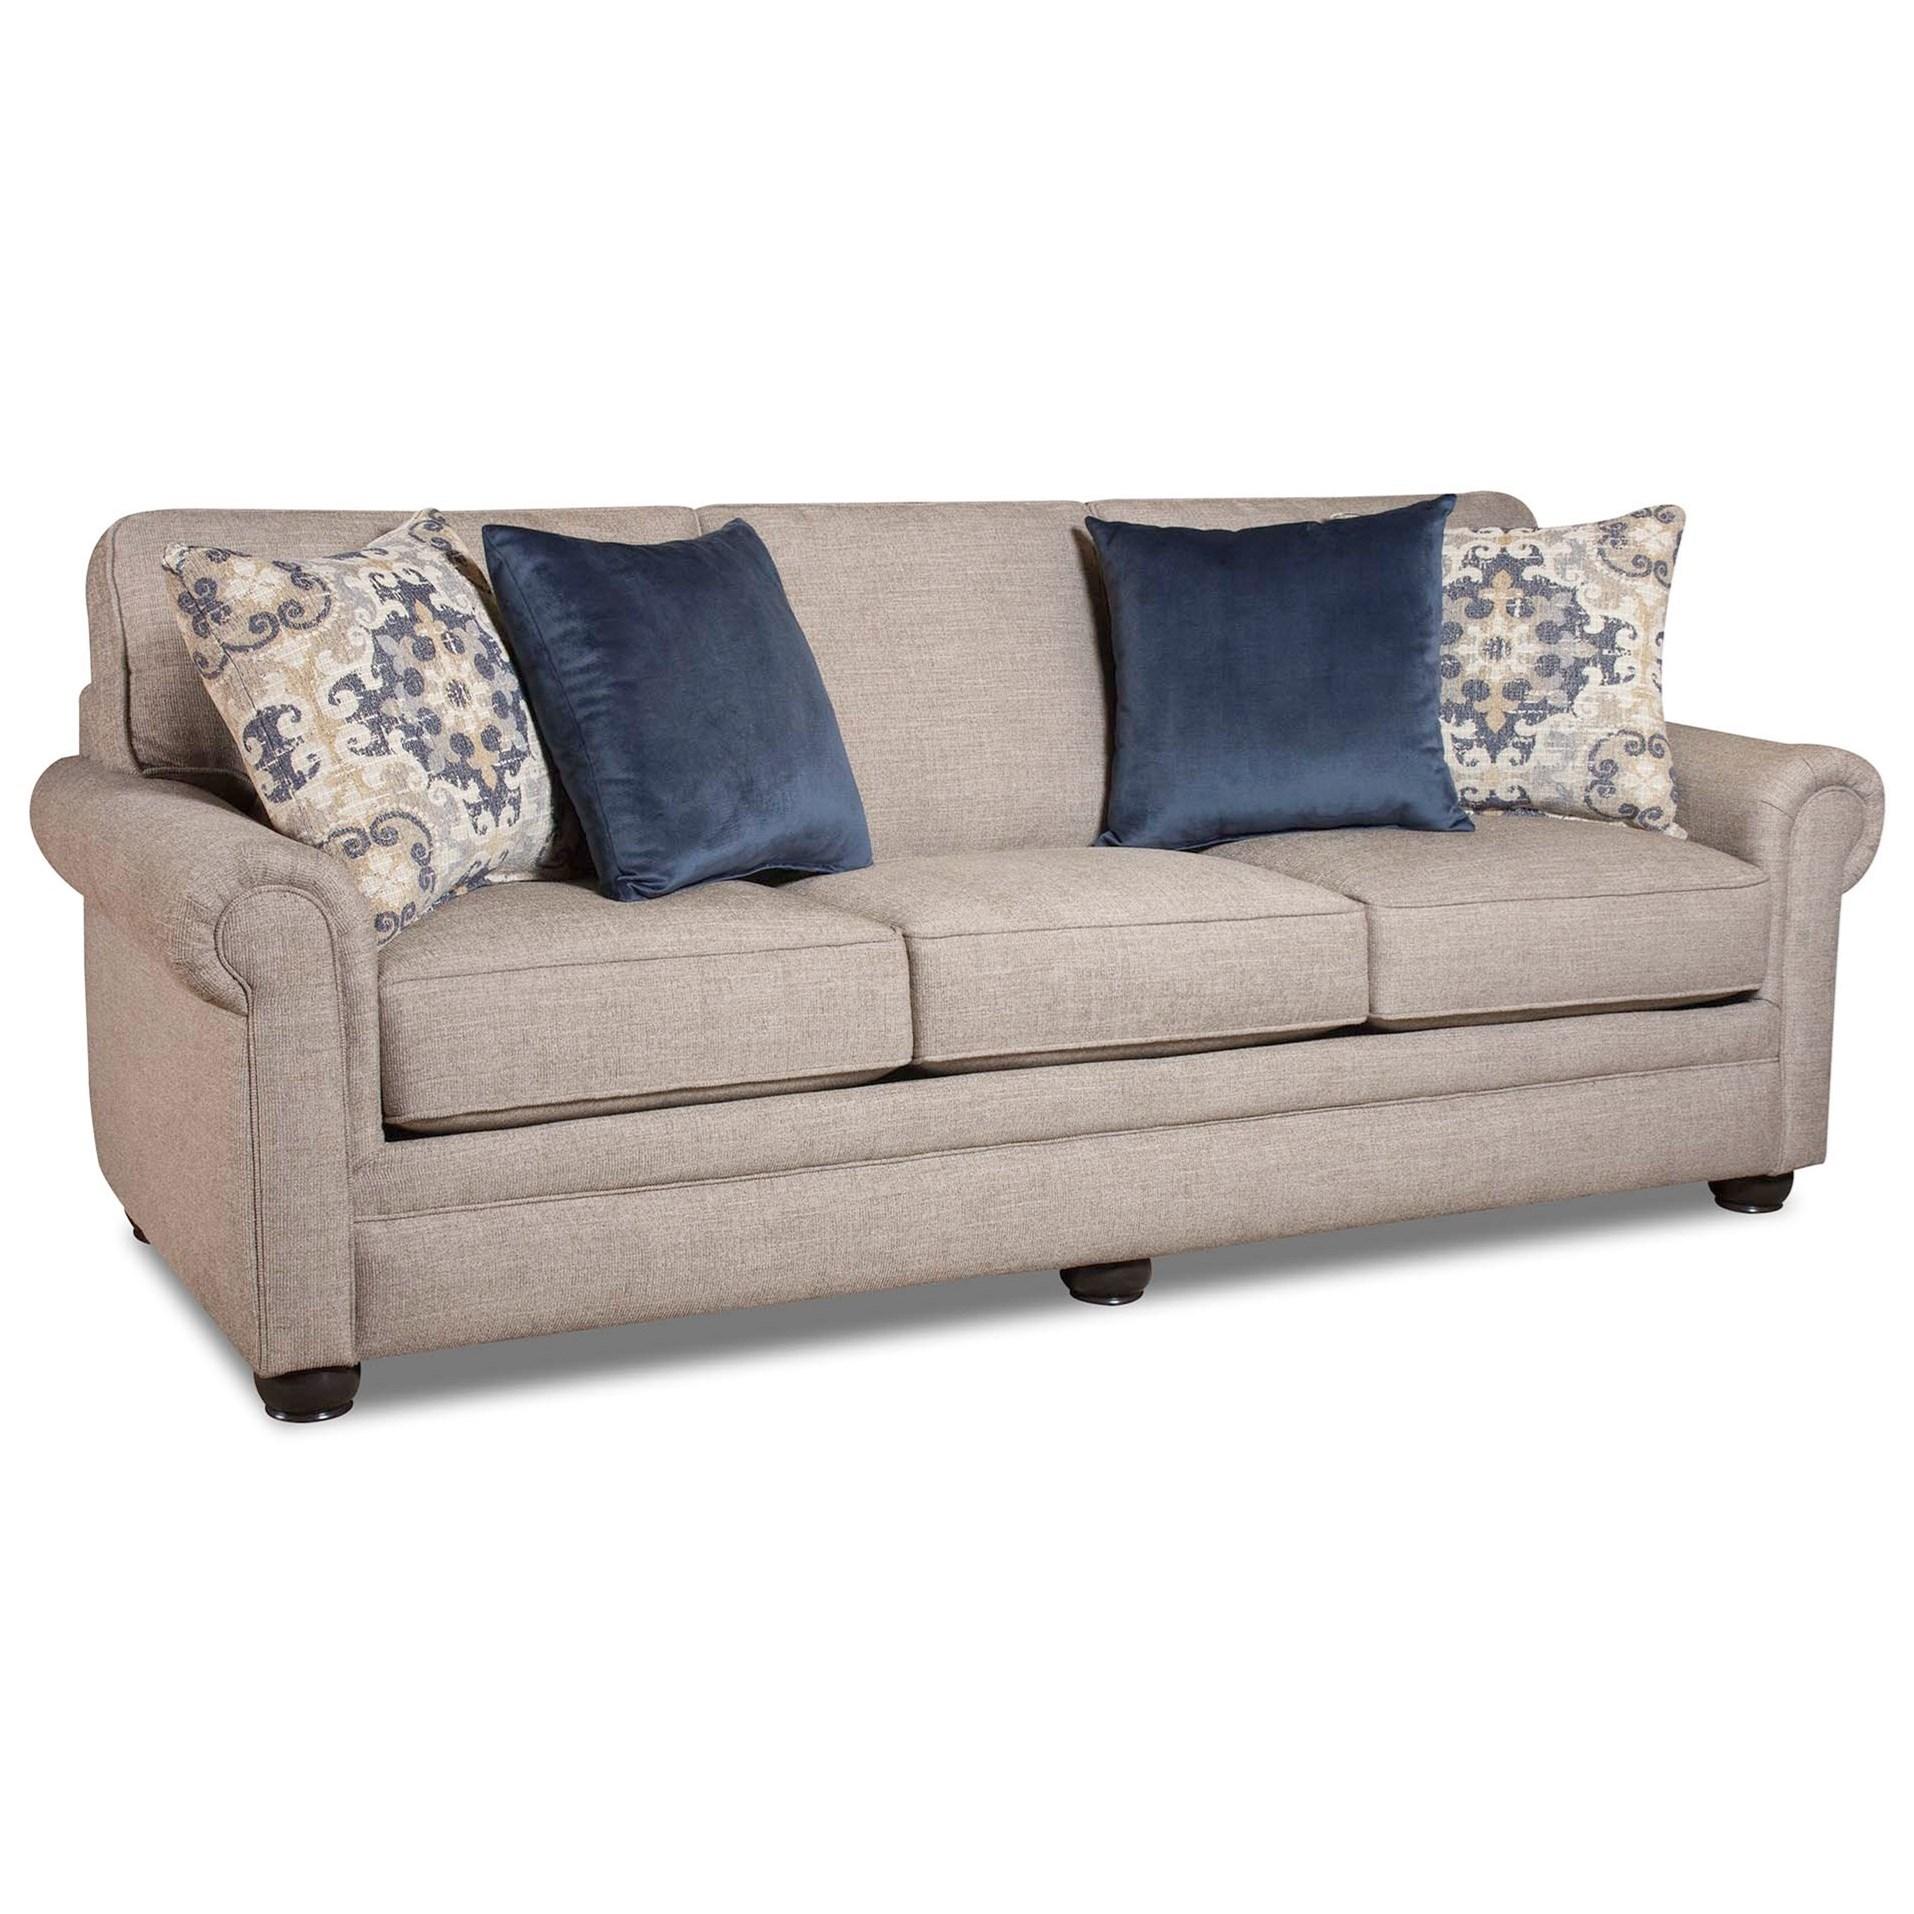 Corinthian 97C0 Sofa - Item Number: FG97C3-LILOU-HEATHER